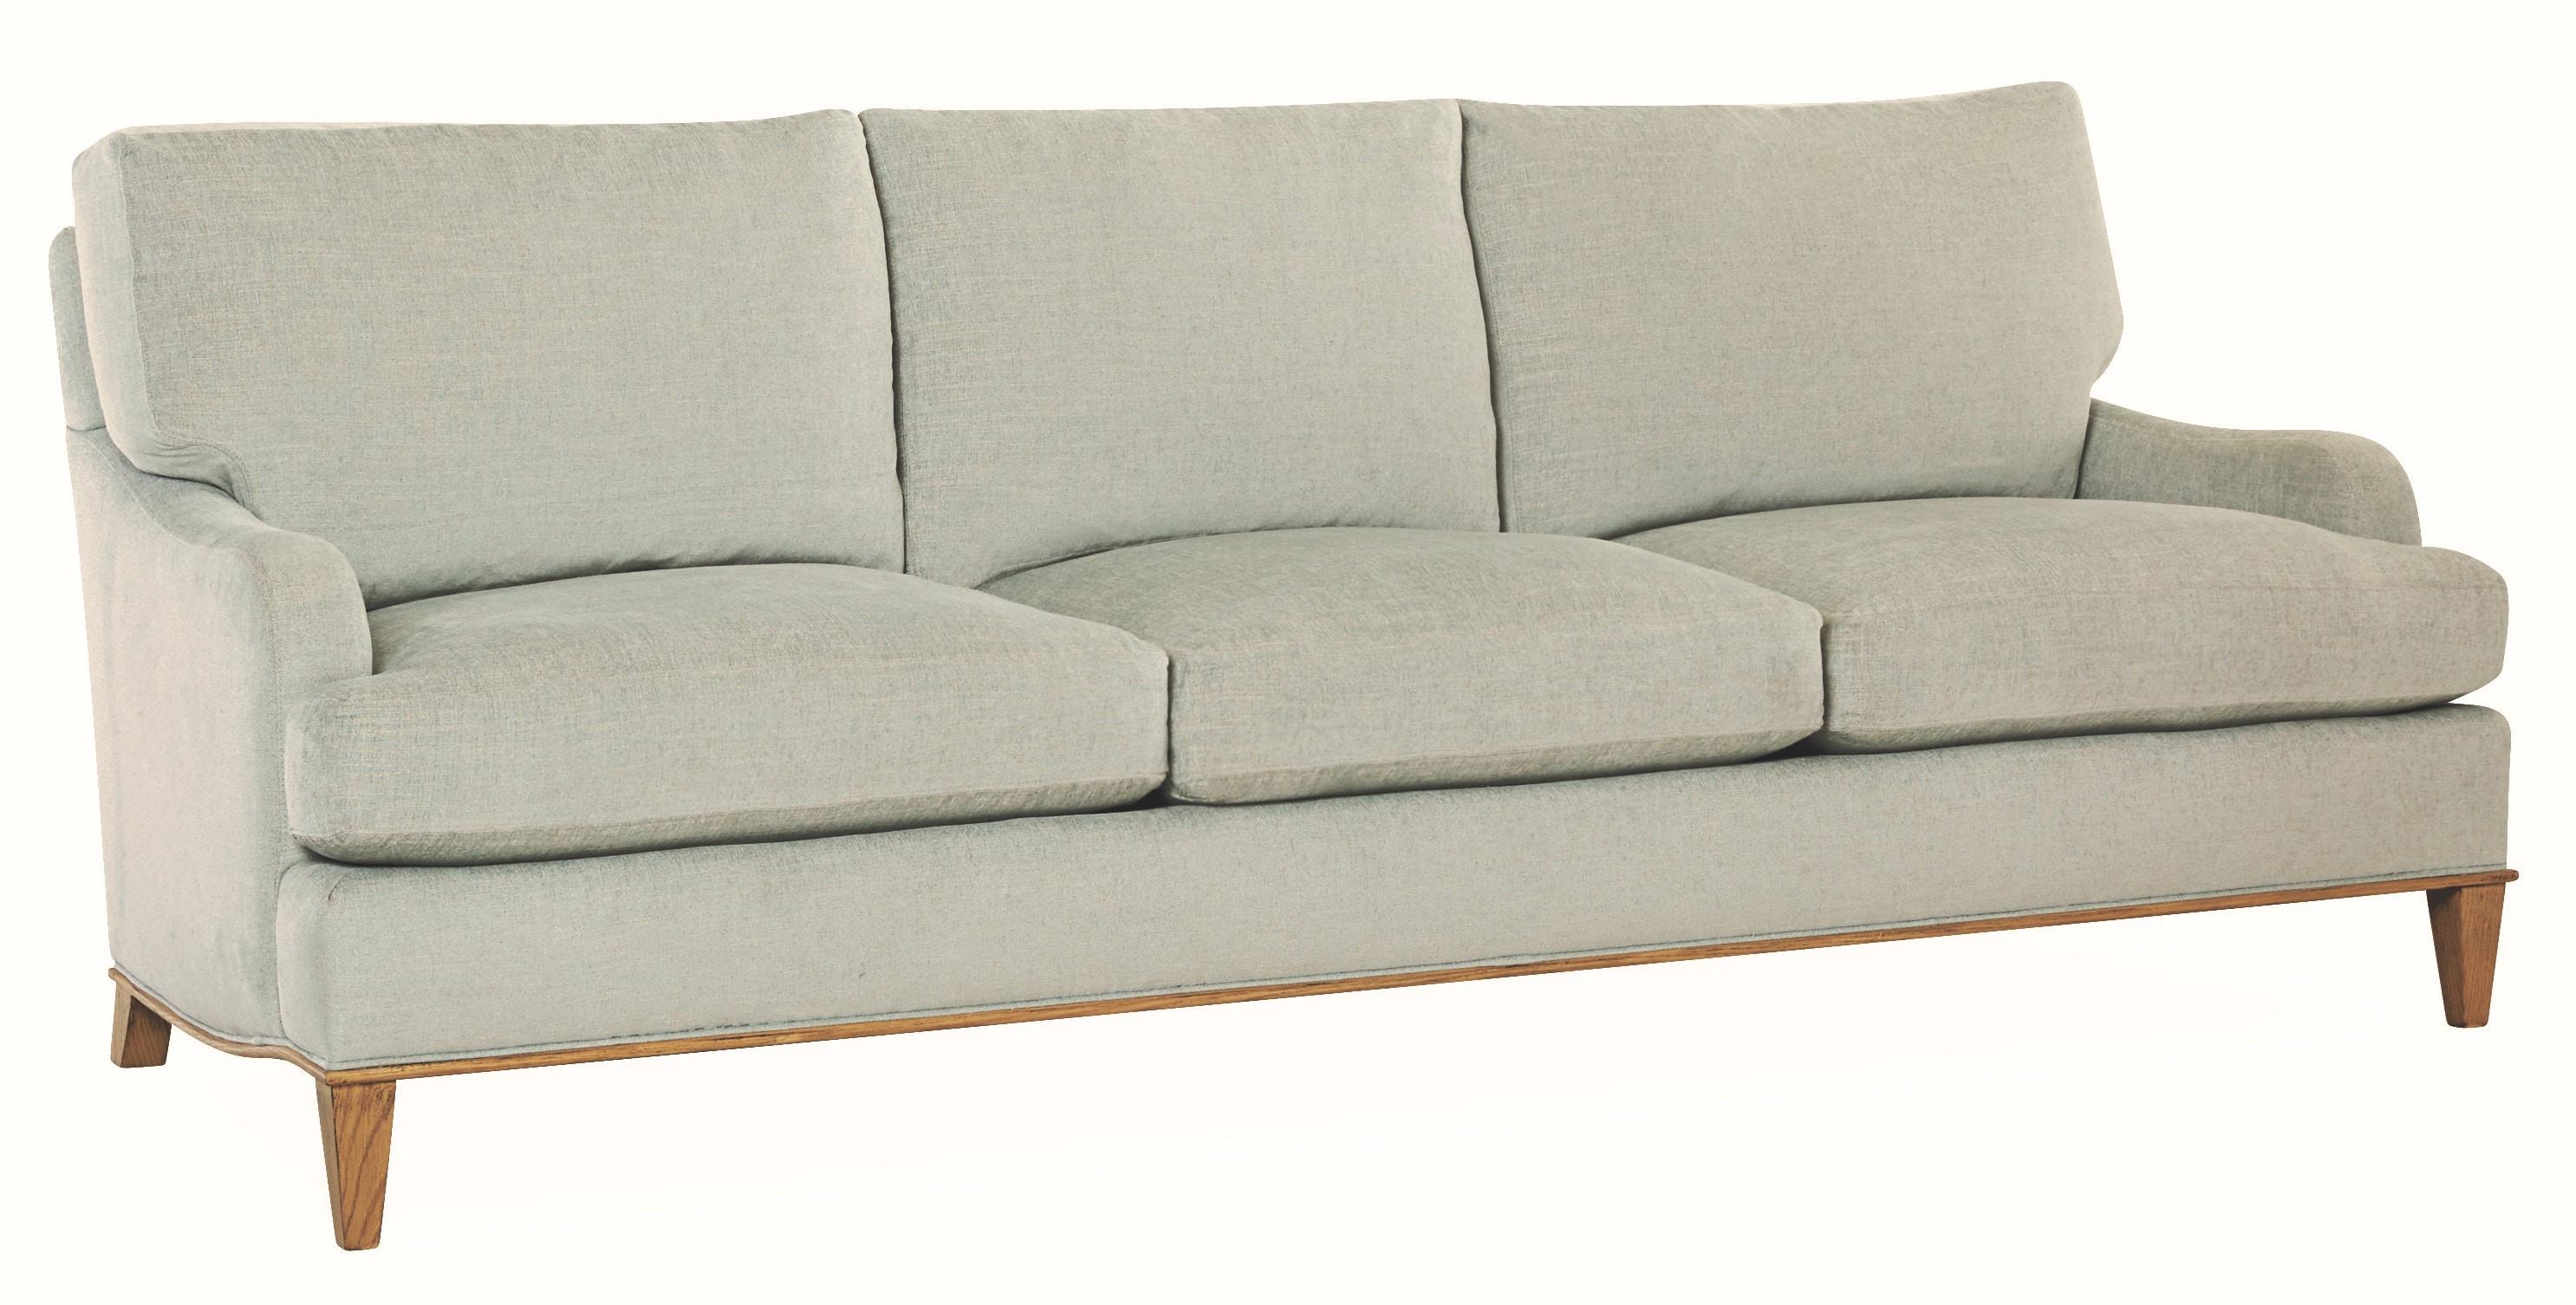 Living room furniture vancouver wa interior design for Furniture vancouver